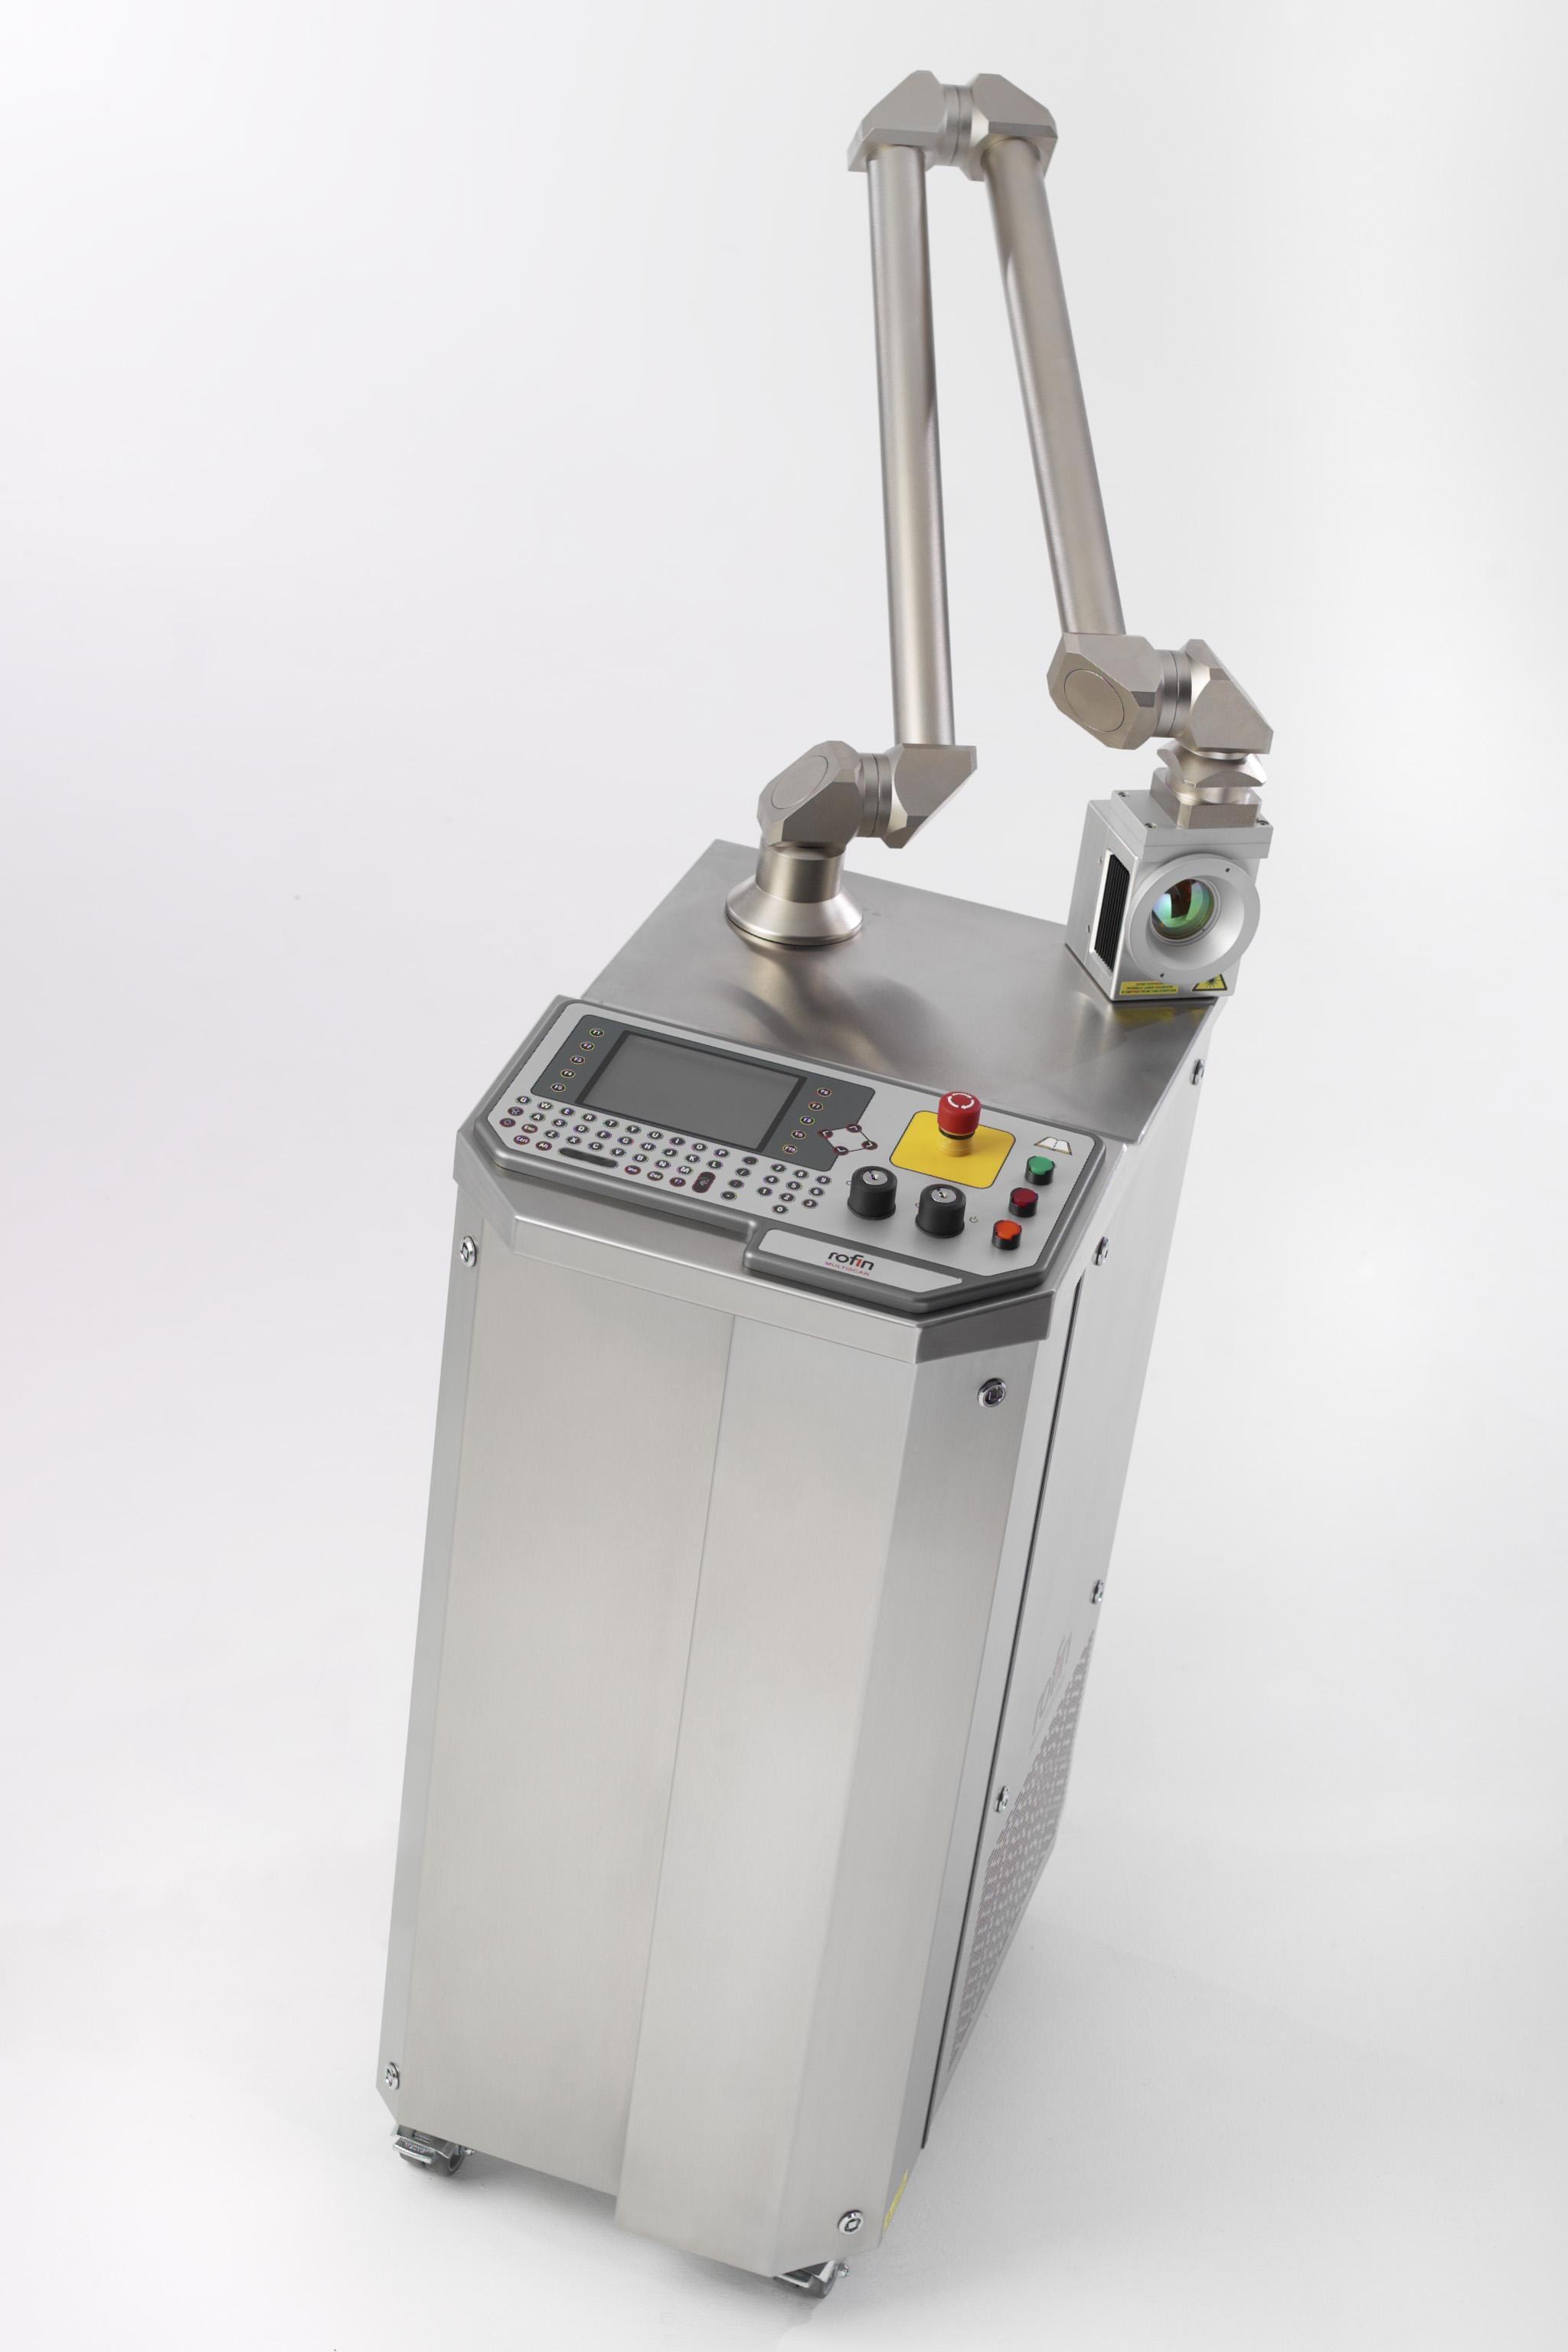 Rofin laser marking systems